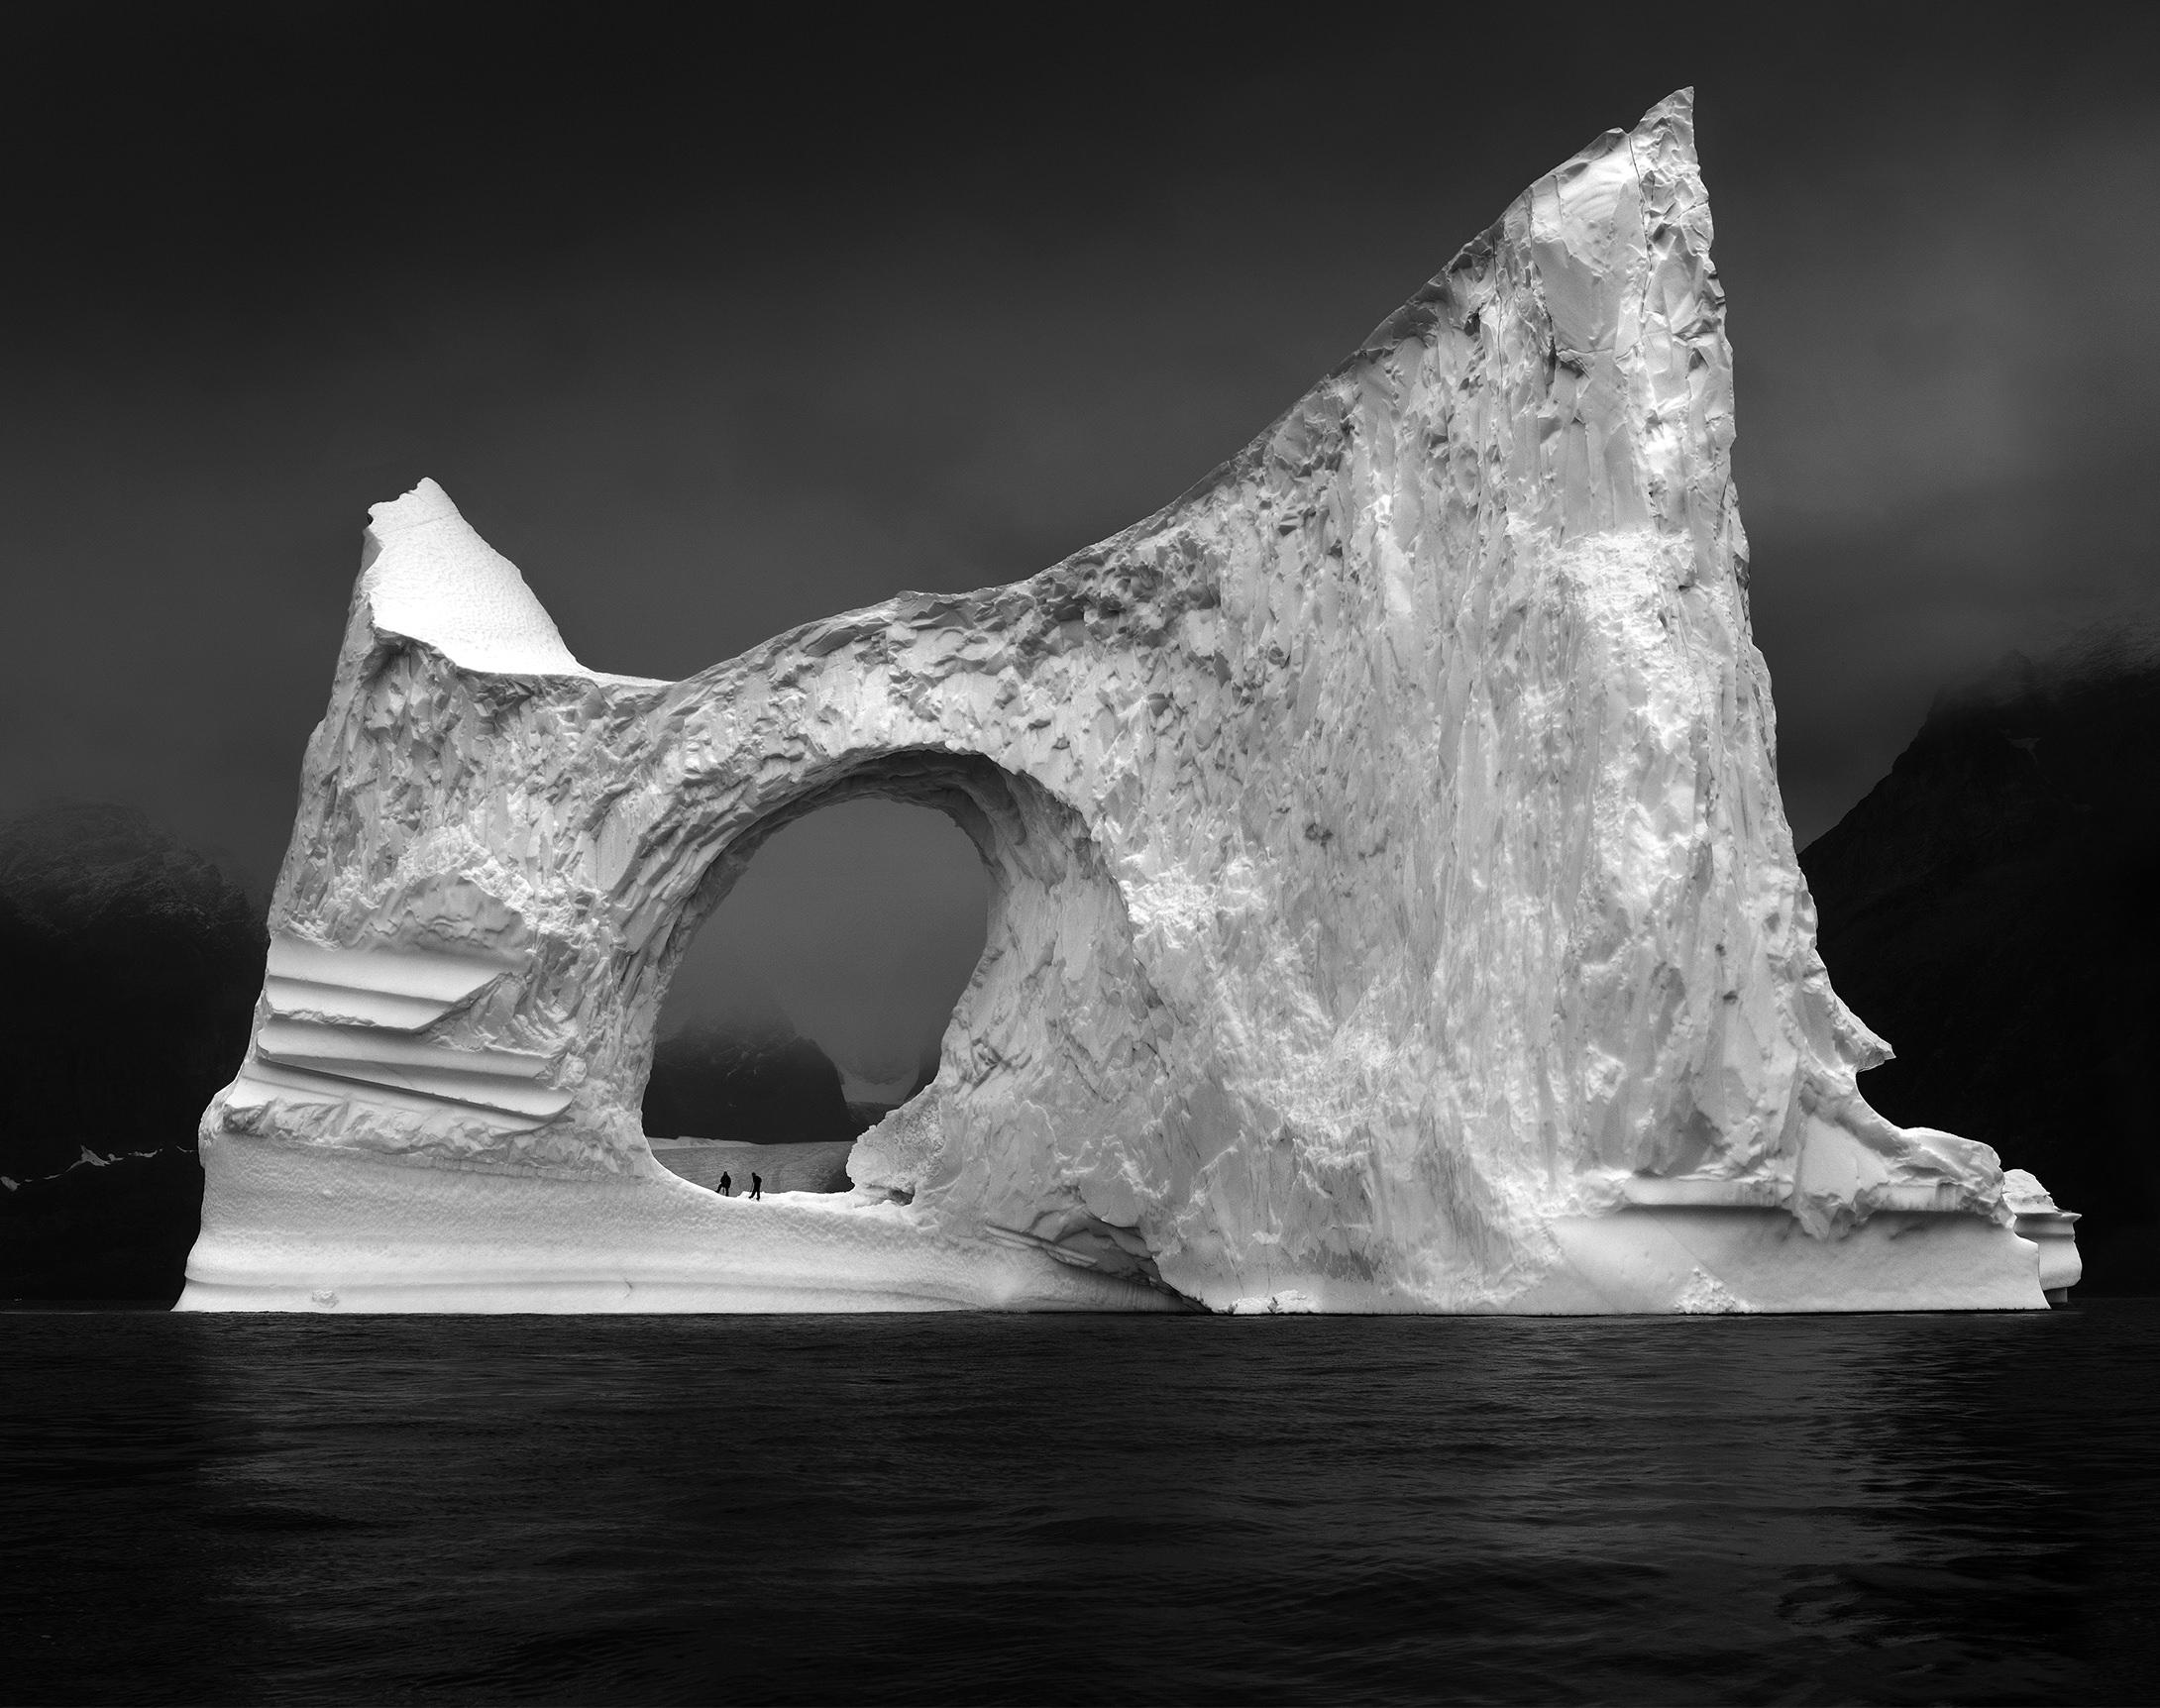 Ragnar Axelsson Photographie Islande Glacier Faces of The North Last days In The Arctic